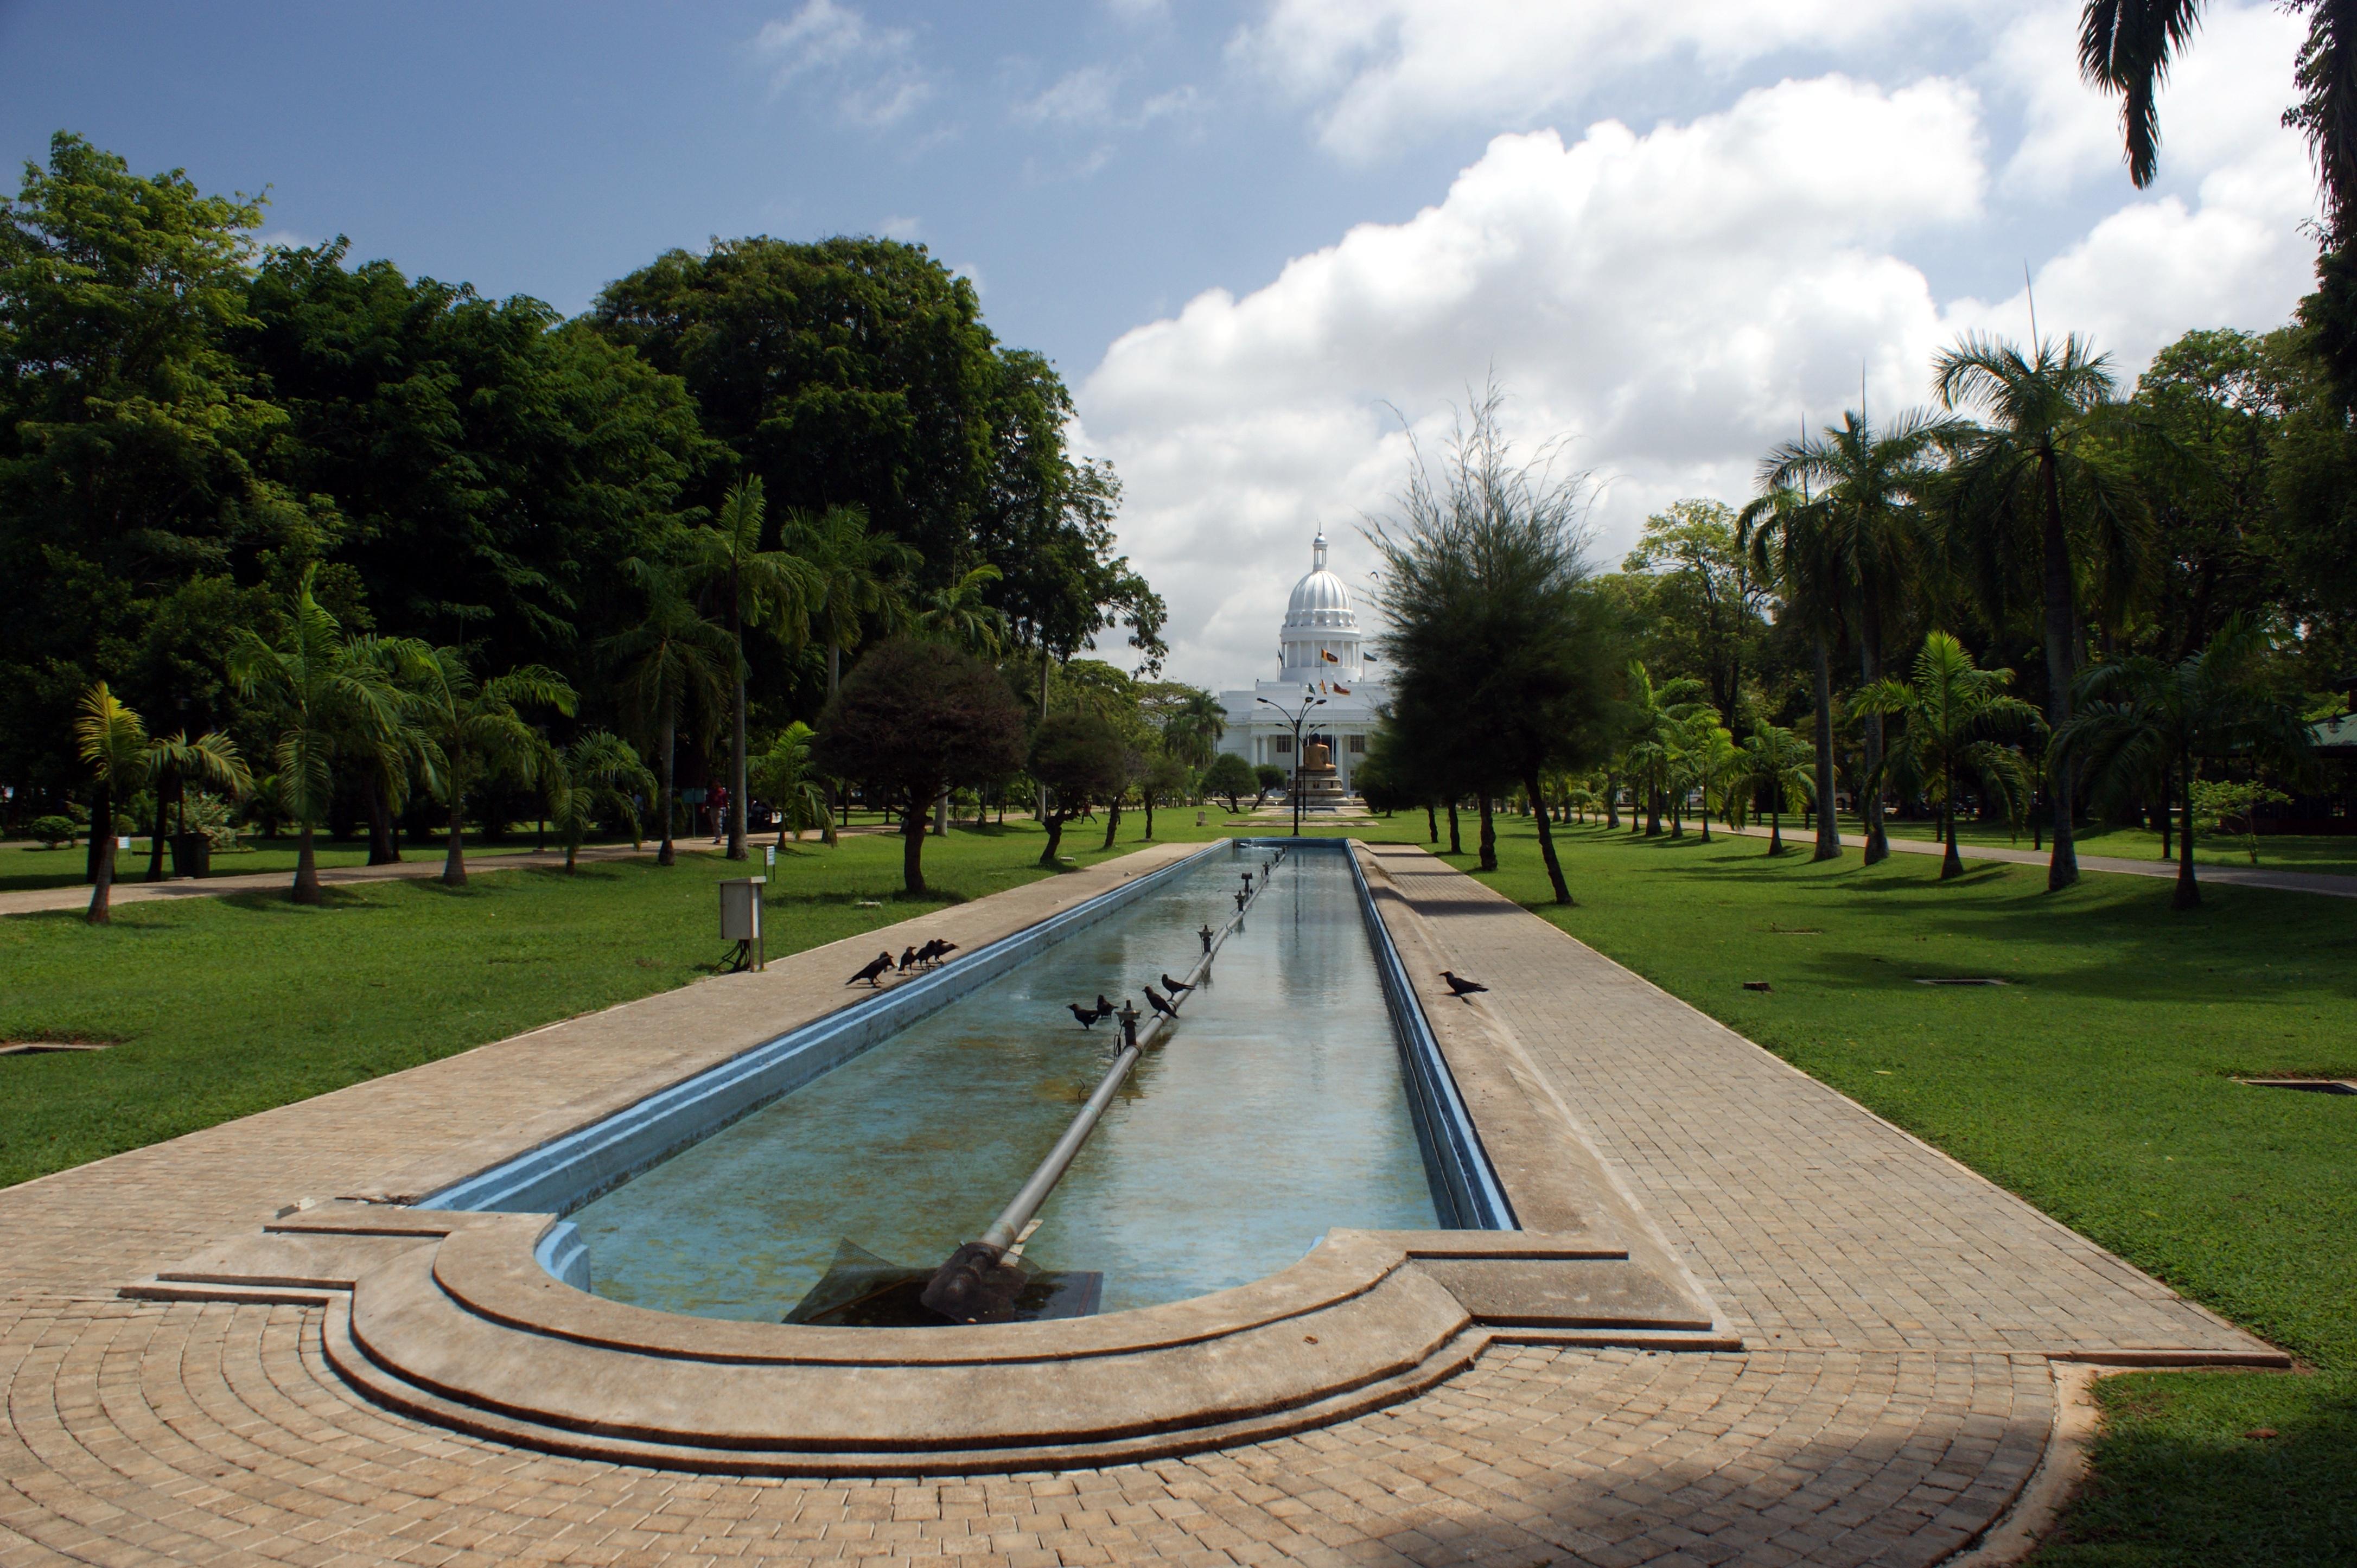 Victoria park srilanka, colombo park